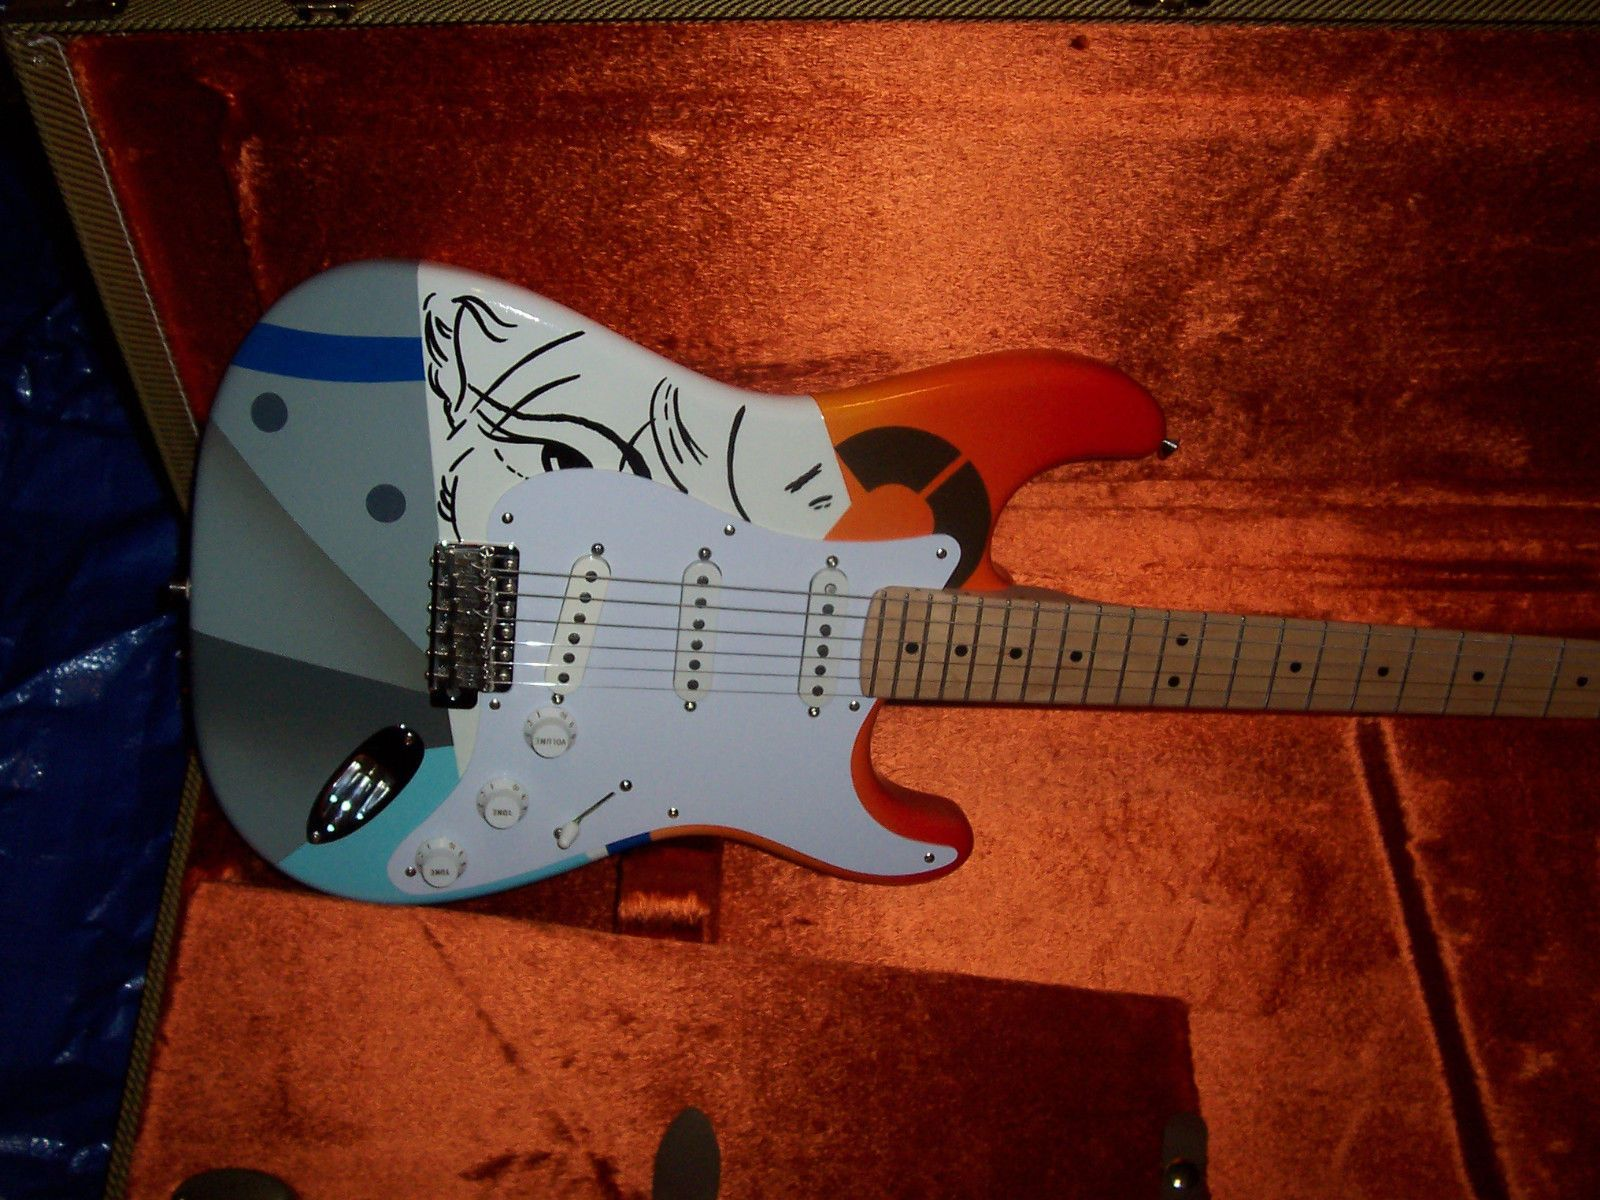 hight resolution of crash 1 eric clapton fender stratocaster guitar strat usa american vintage desig